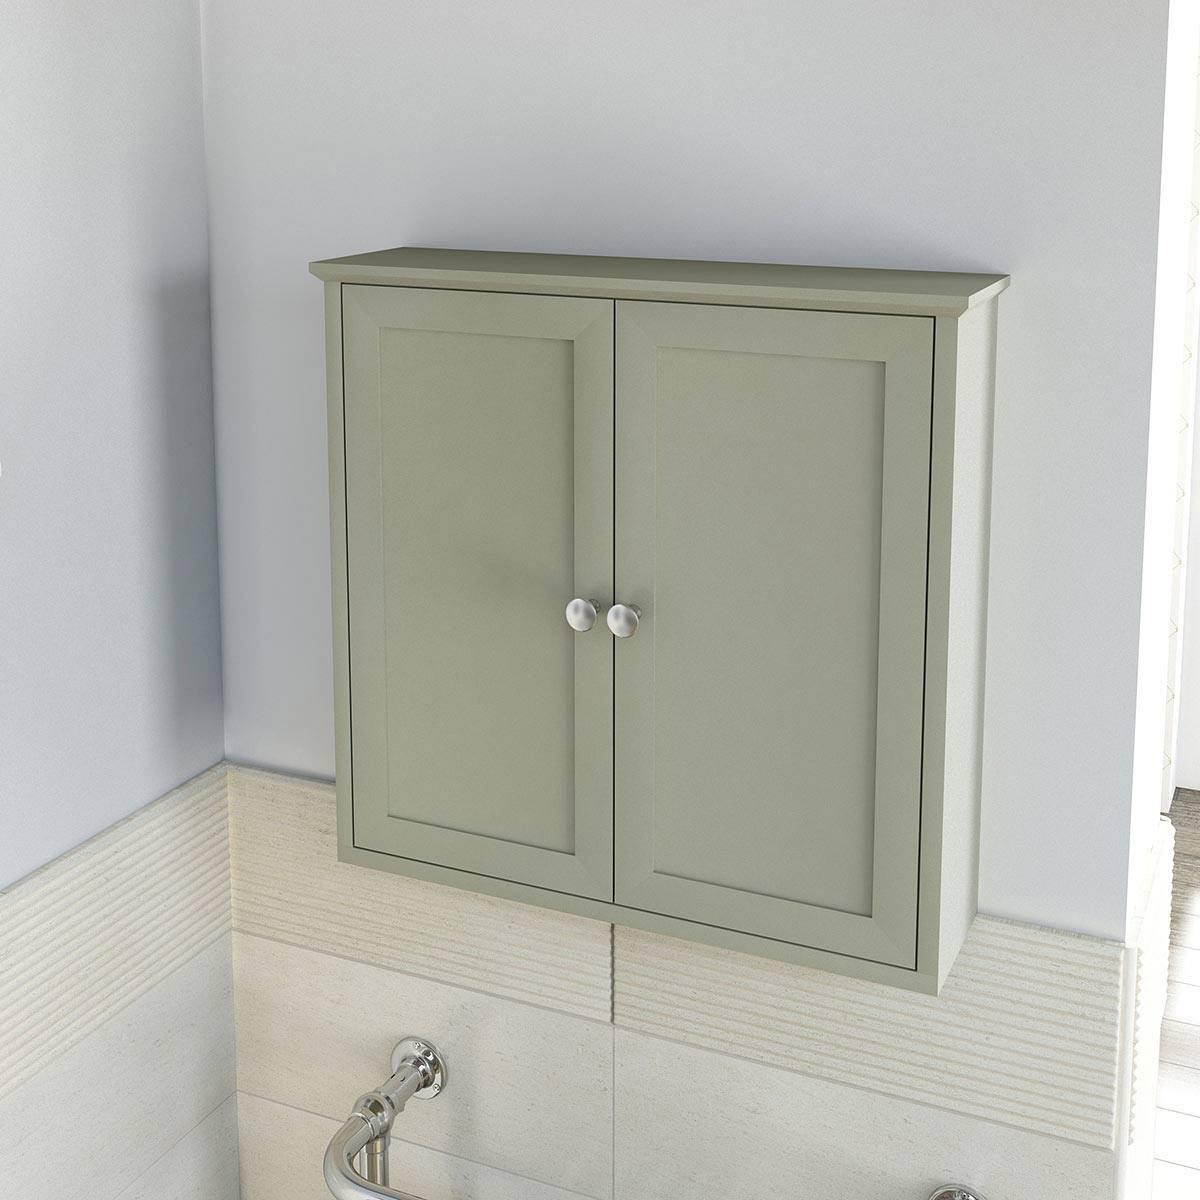 Terrific slim bathroom storage photos designs dievoon for Slim bath cabinet